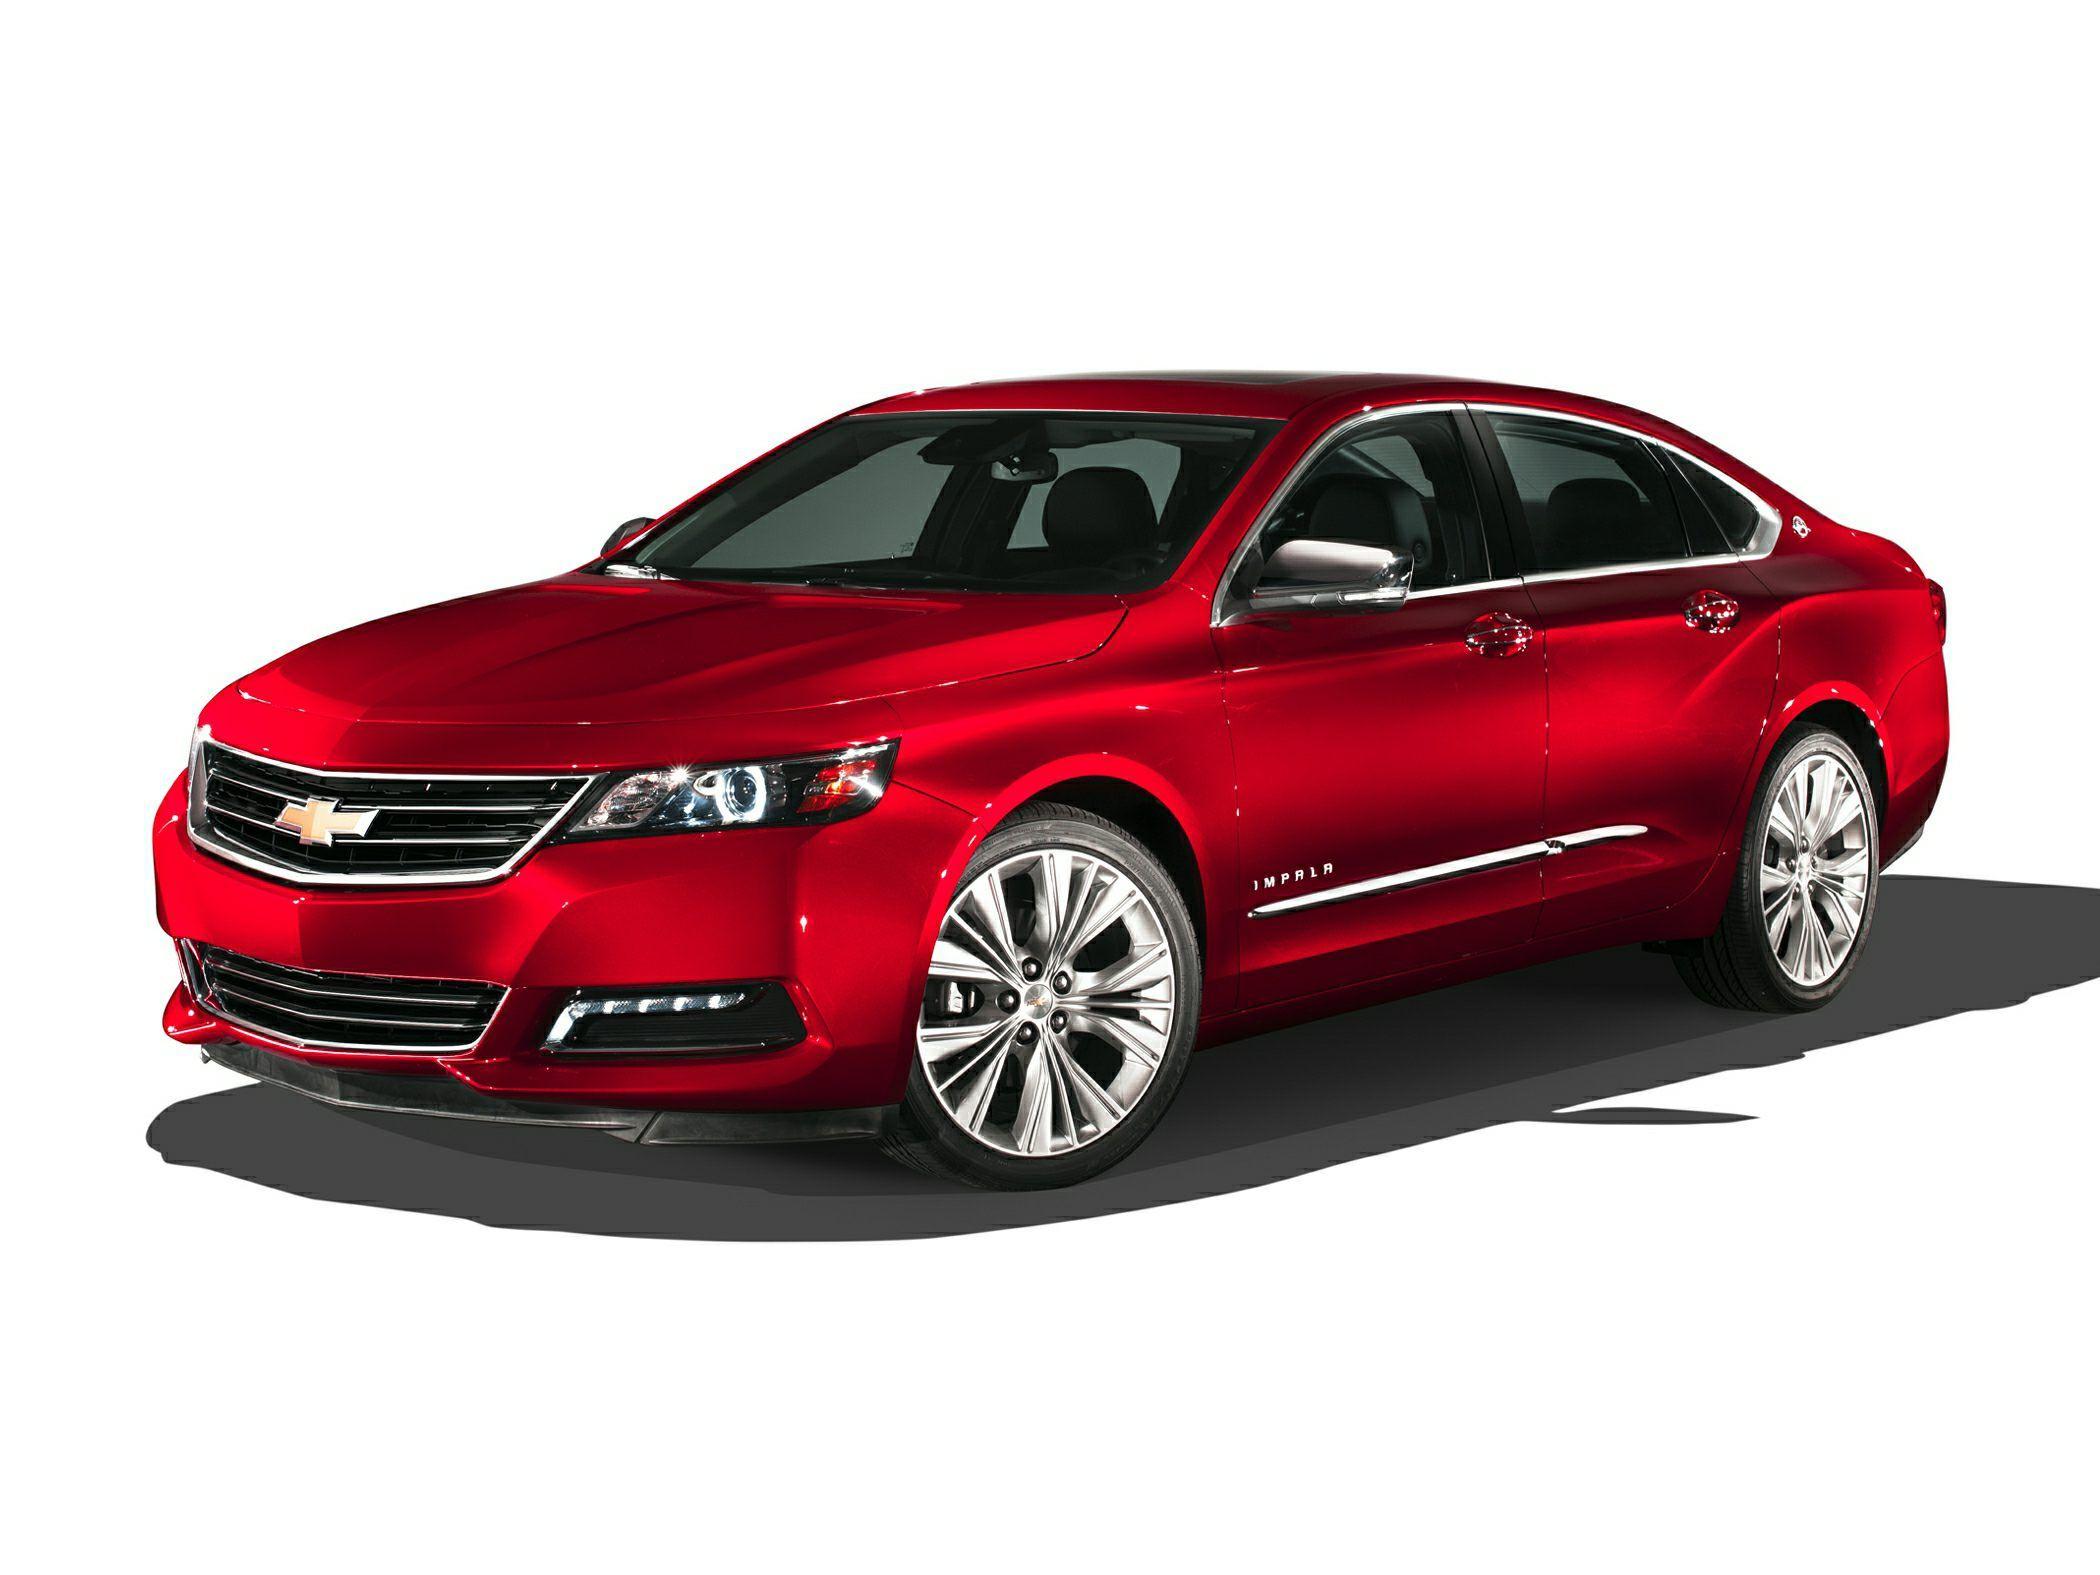 New 2015 Chevrolet Impala Price, Photos, Reviews, Safety